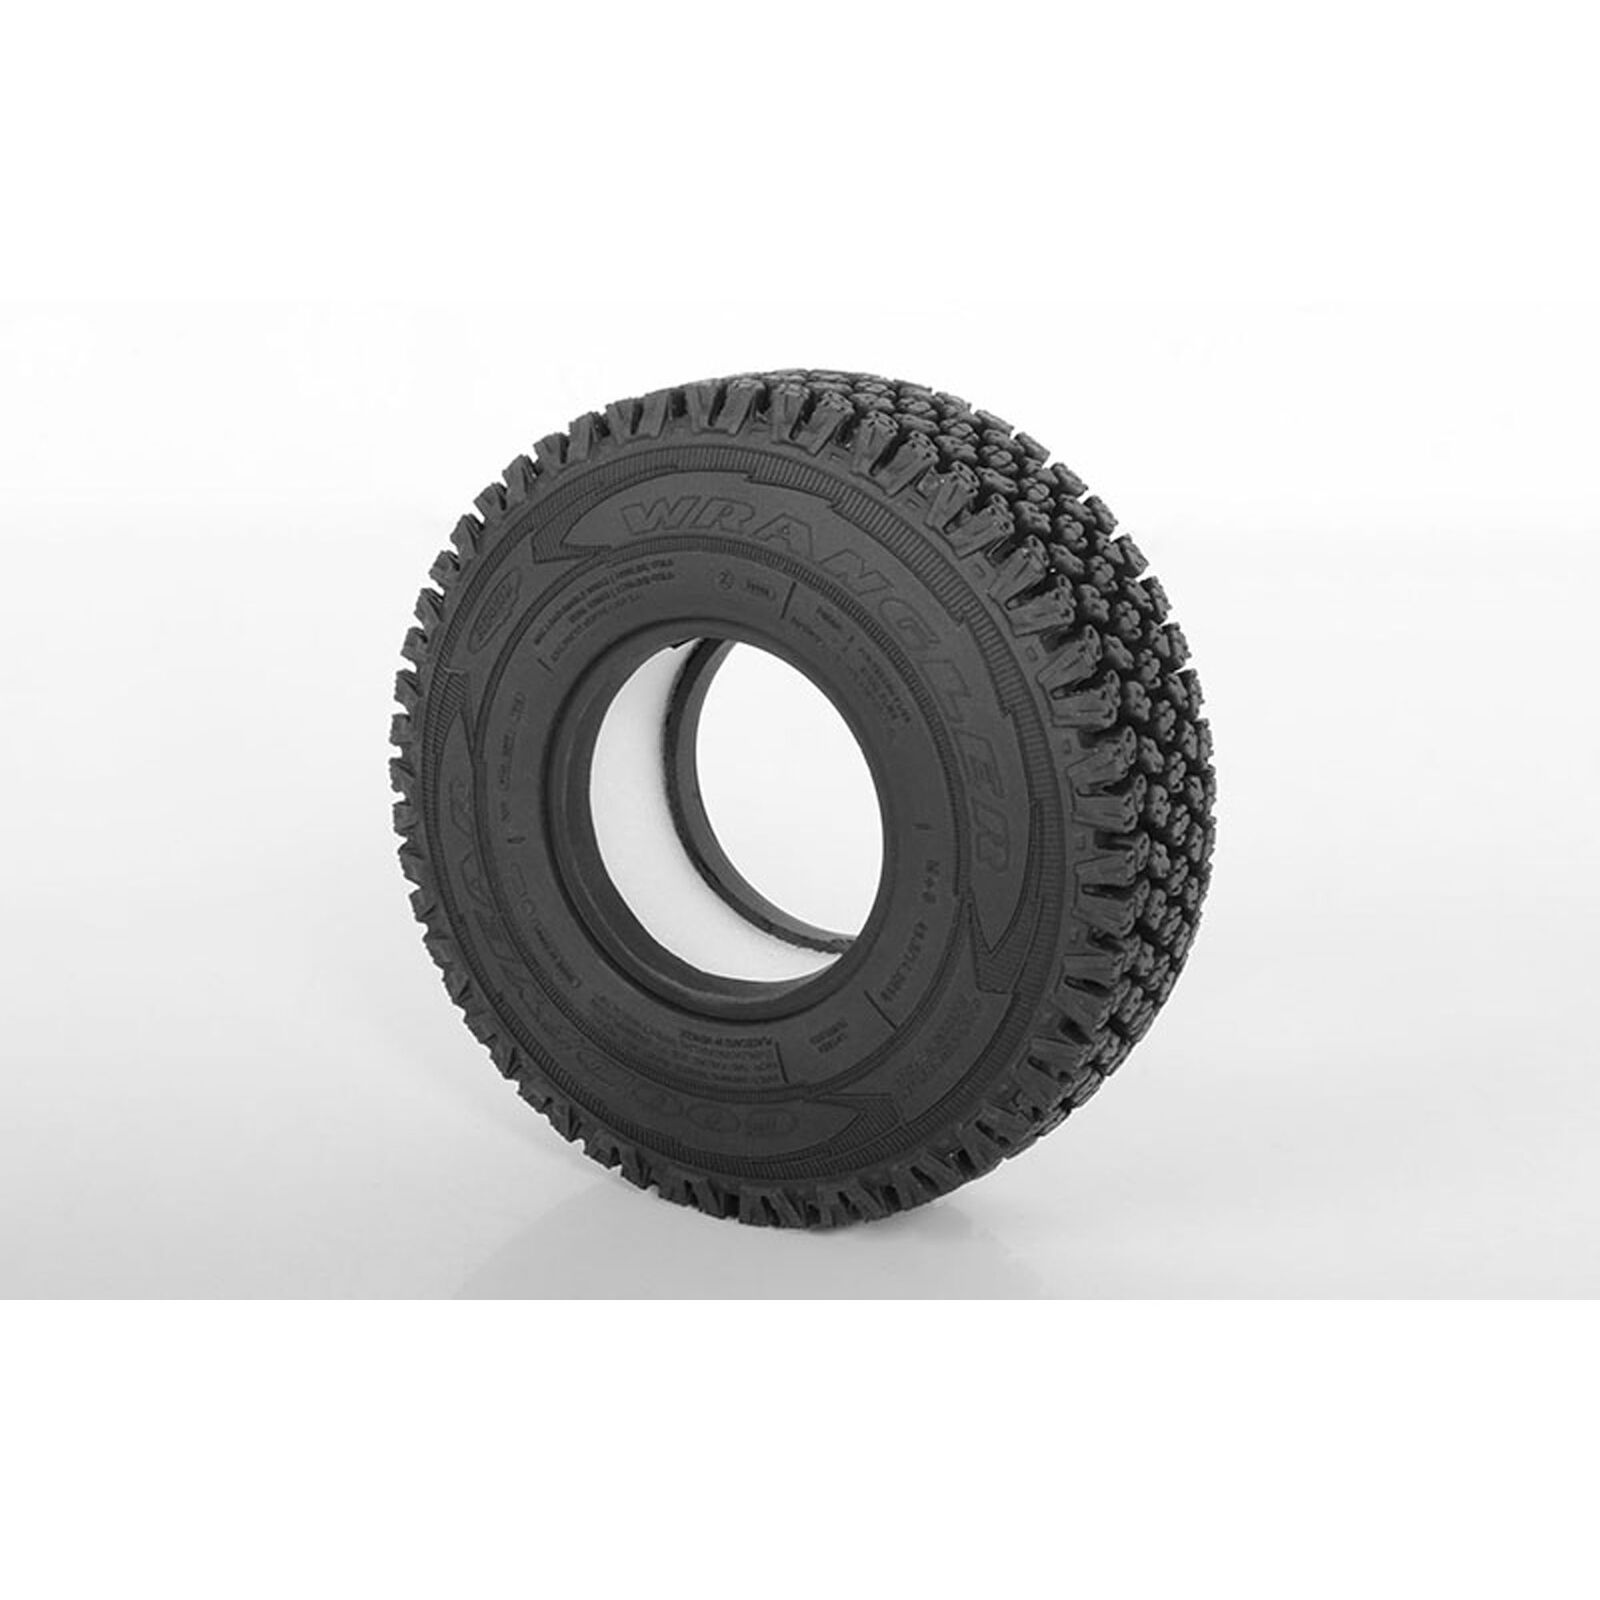 "Goodyear Wrangler All-Terrain Adventure 1.9"" Tire"